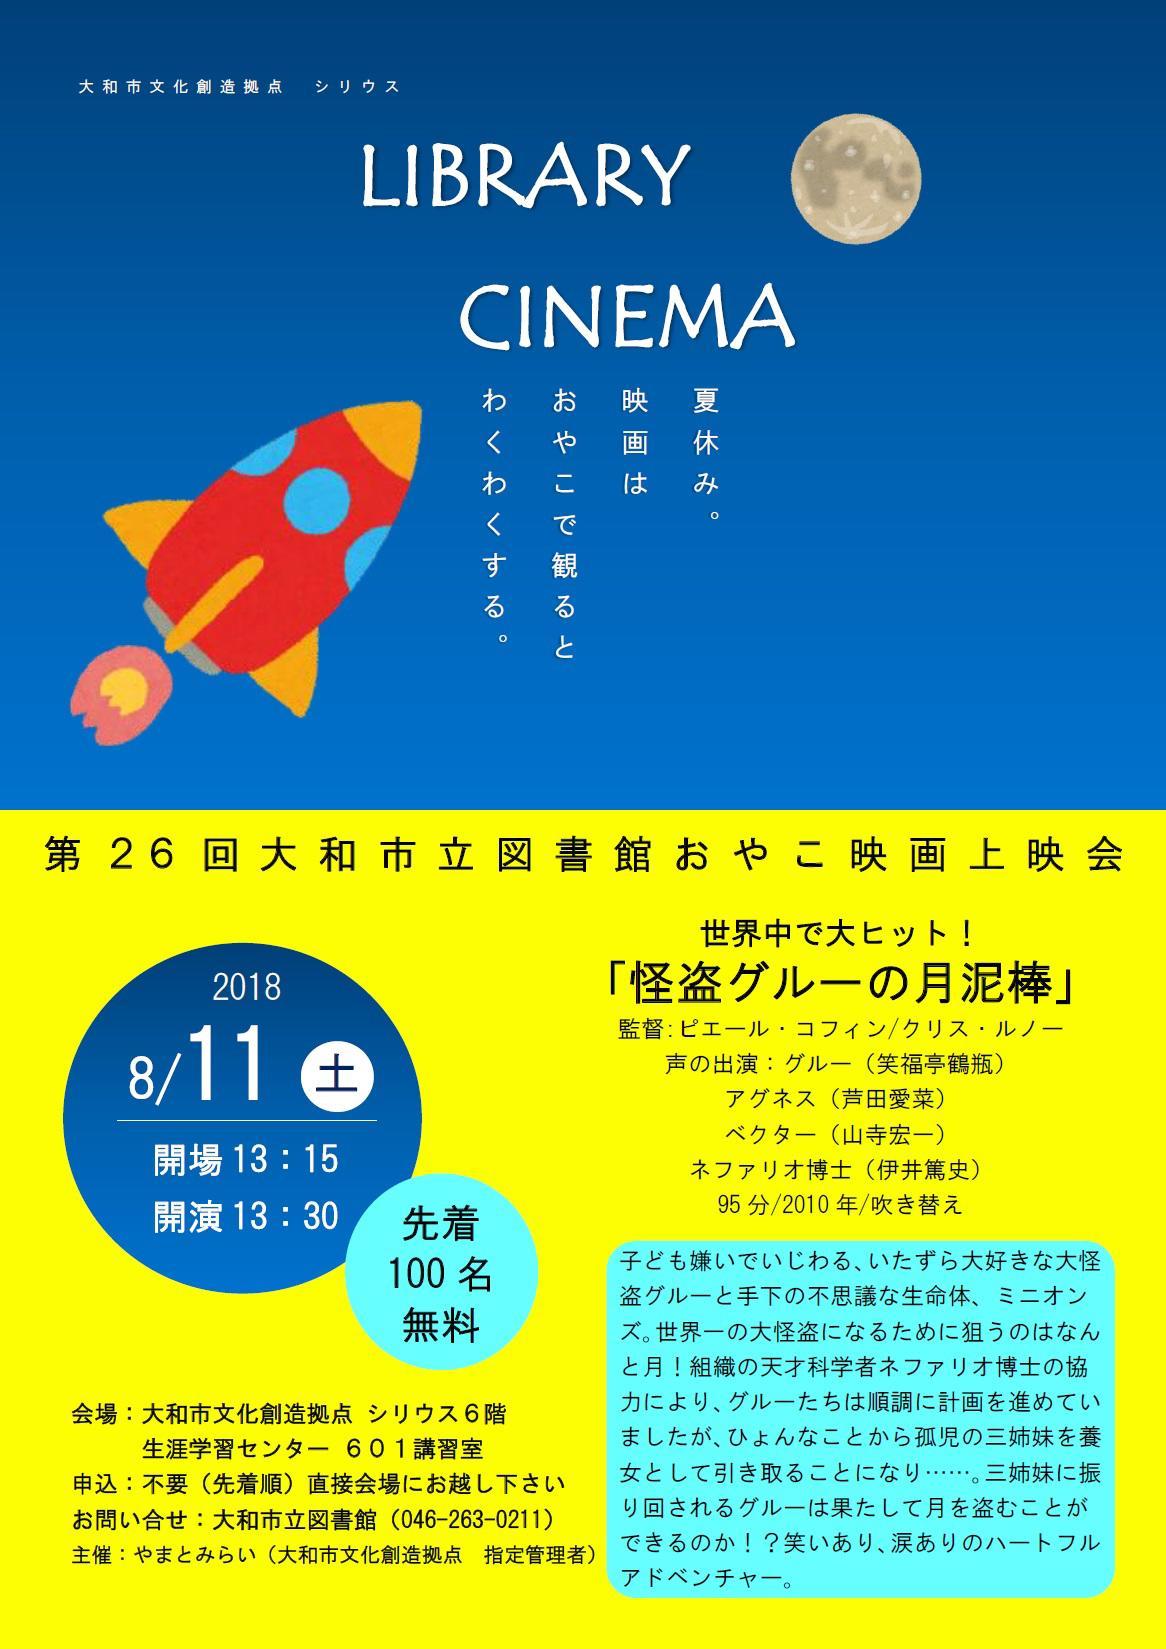 LIBRARY CINEMA第26回大和市立図書館おやこ映画上映会